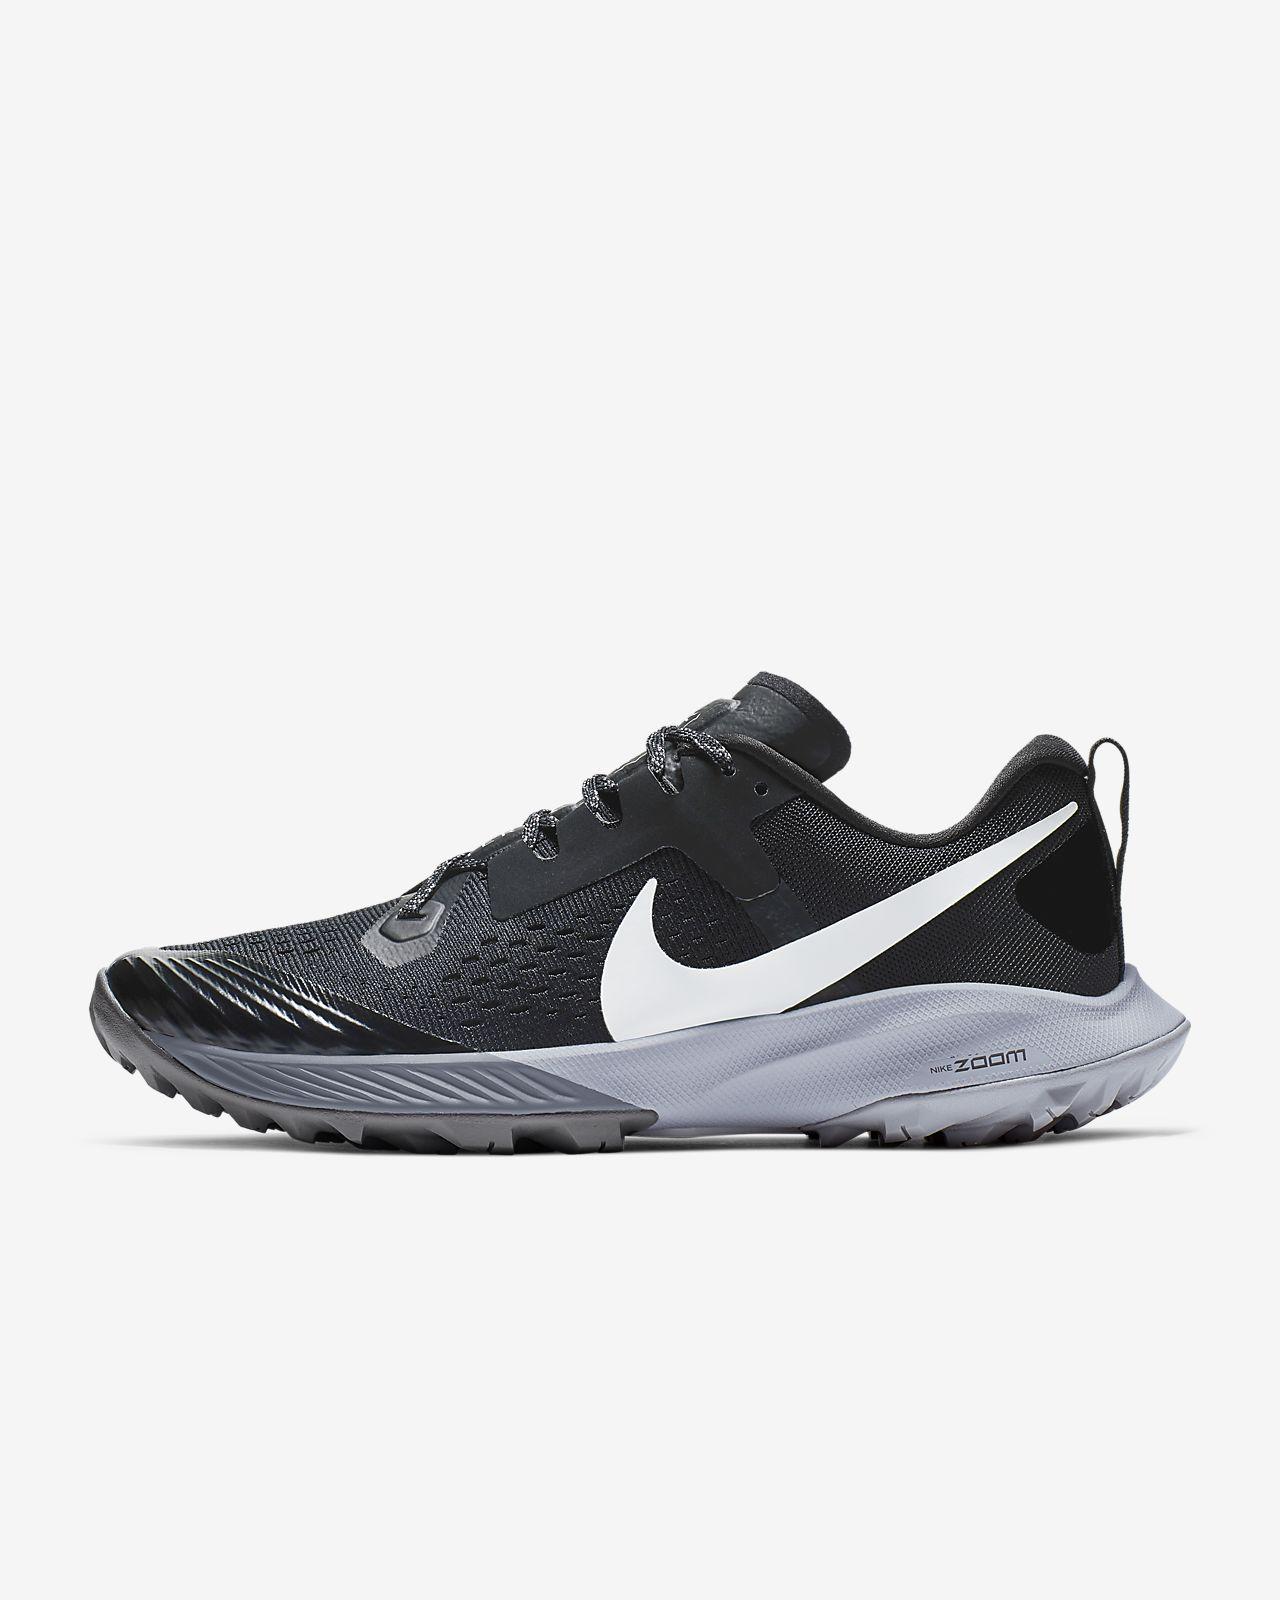 low priced 0259a f25ab ... Löparsko Nike Air Zoom Terra Kiger 5 för kvinnor